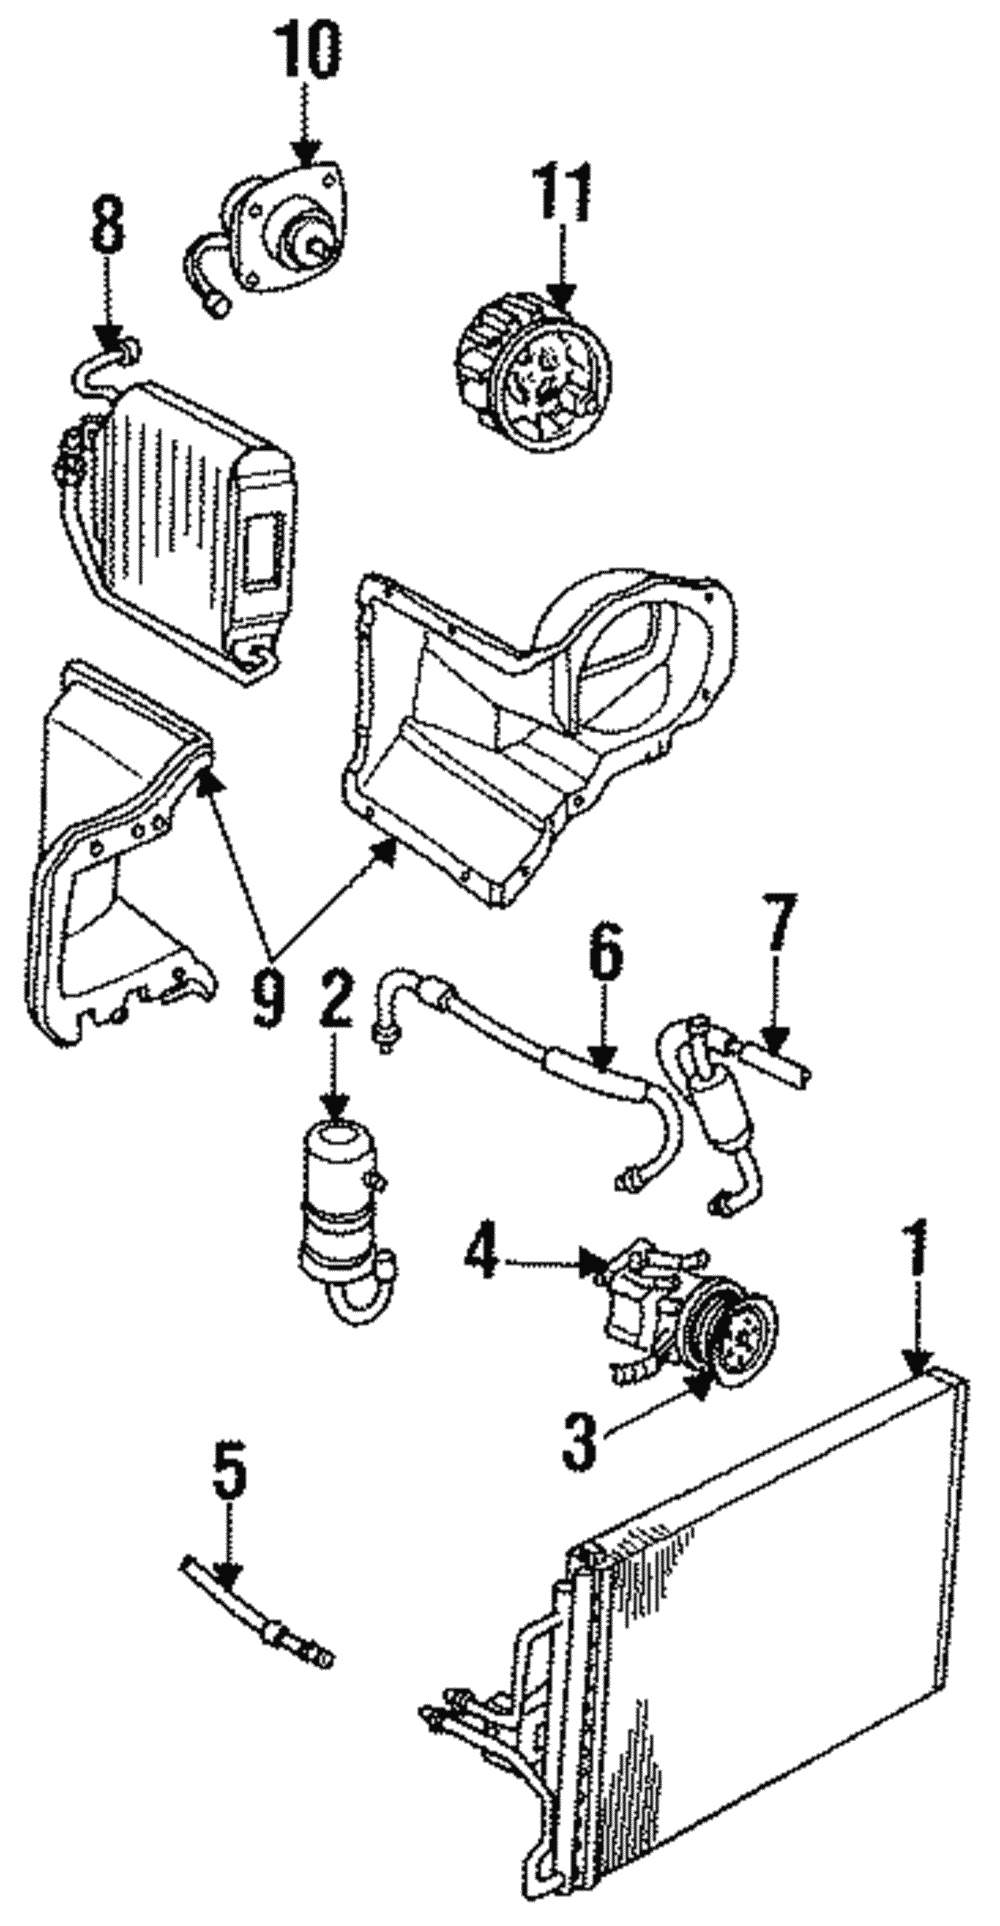 Genuine Ford Accumulator GC2Z-19C836-D